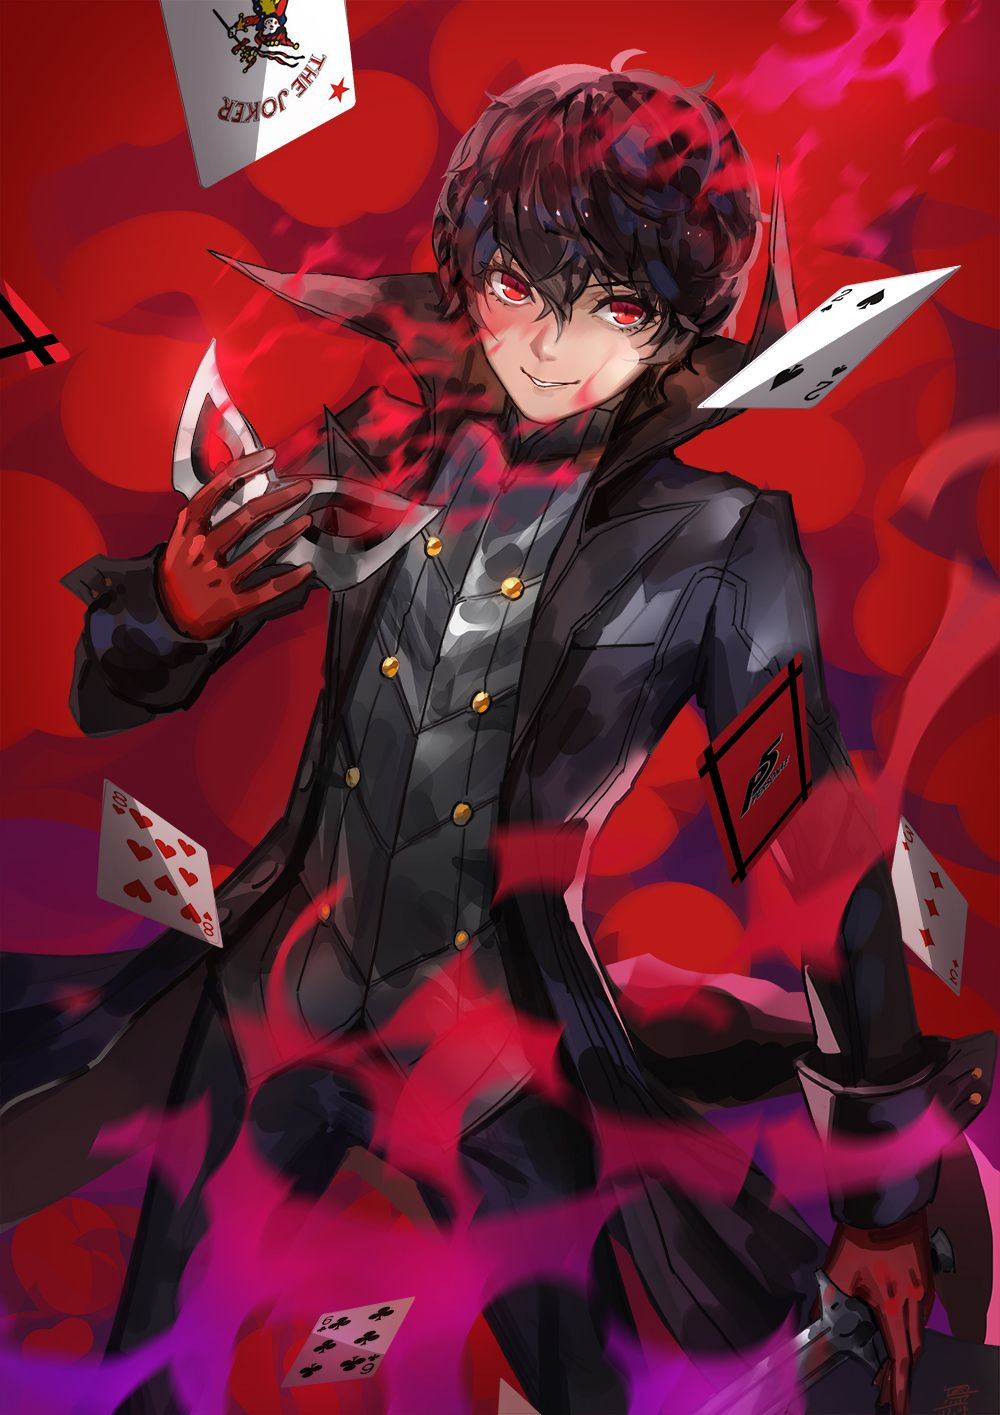 Joker (Persona 5)/2090417 Zerochan Persona 5 anime